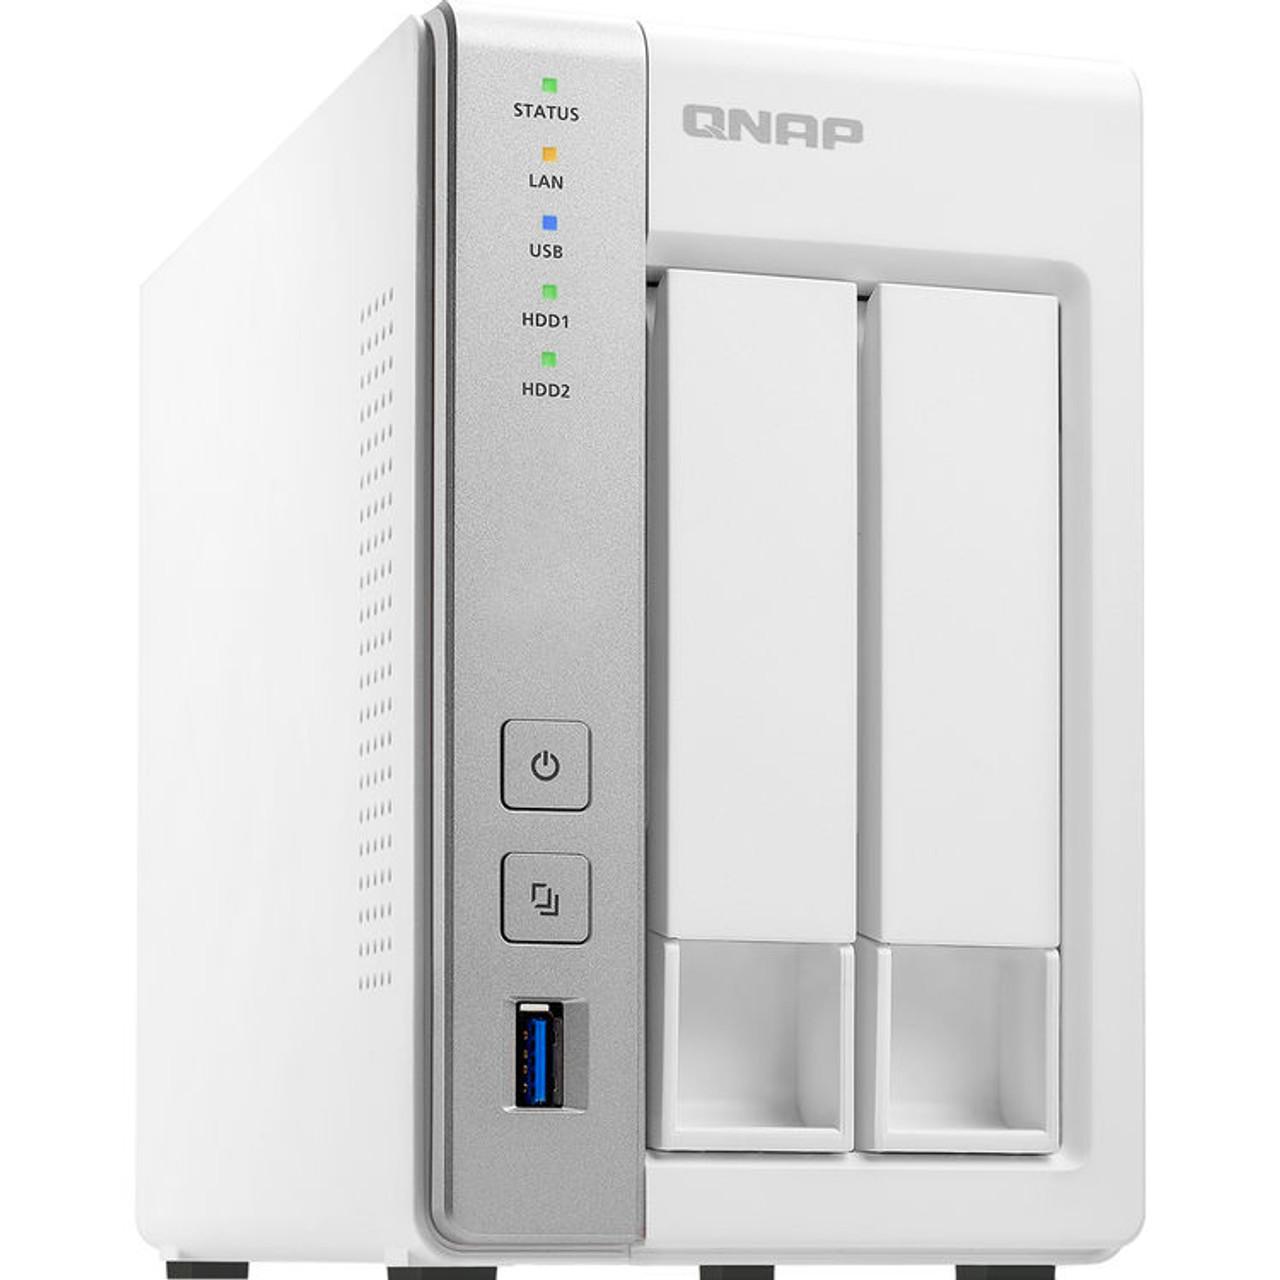 QNAP 2-Bay Personal Cloud NAS file sharing and backup with DLNA